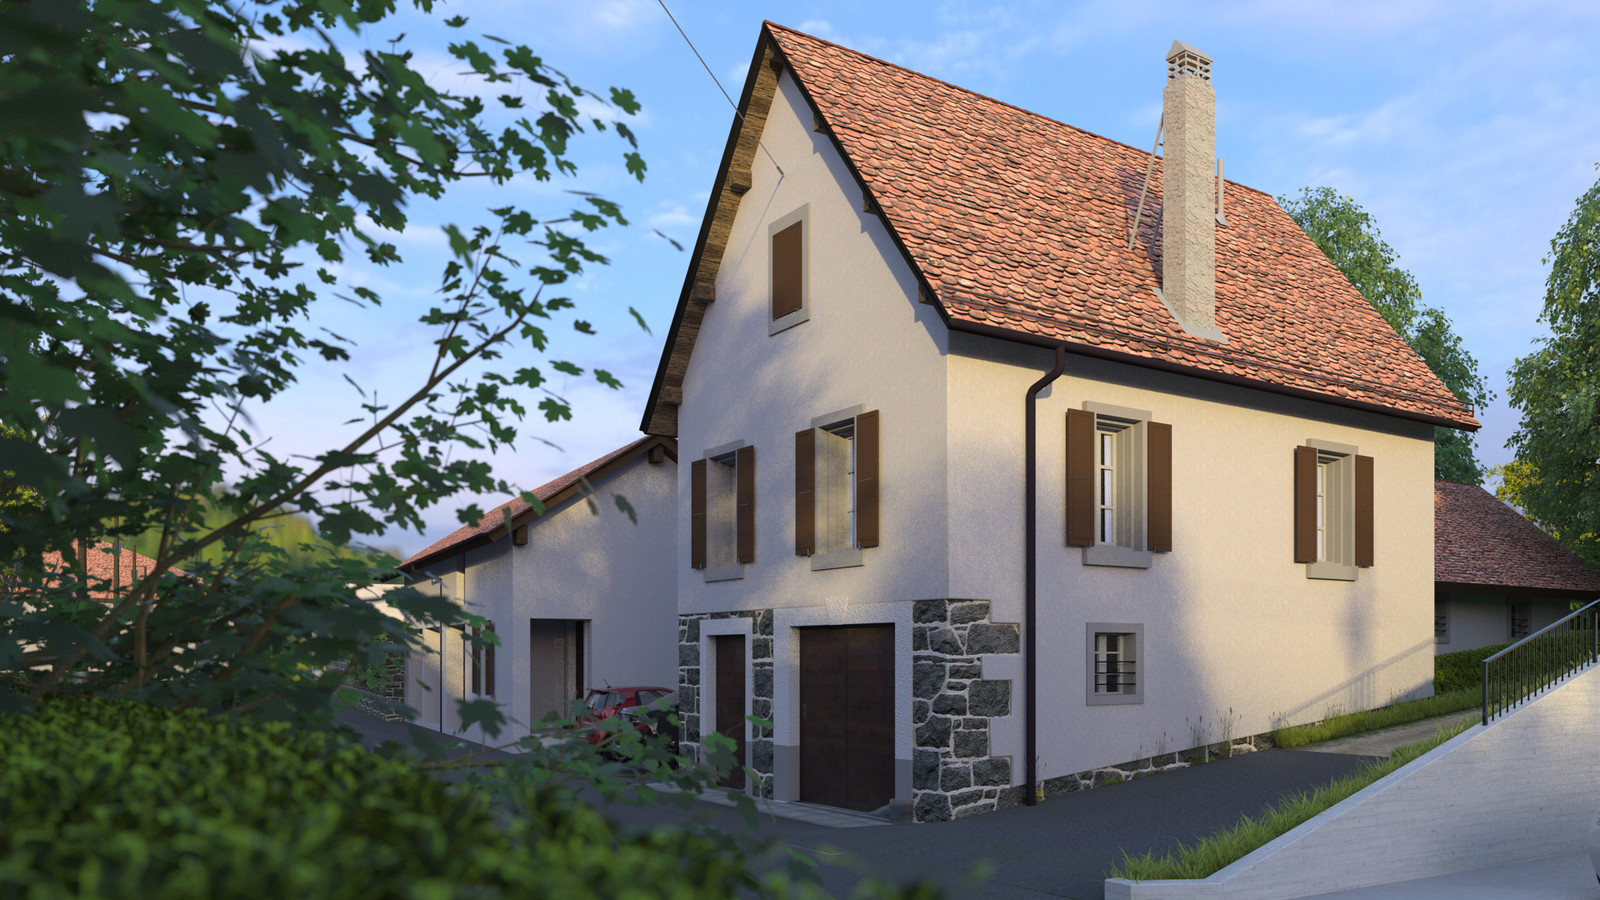 SketchUp + Thea Render  Little Swiss House Scene 28 0707 Dawn Sun 02 HD 1920 x 1080 Presto MC